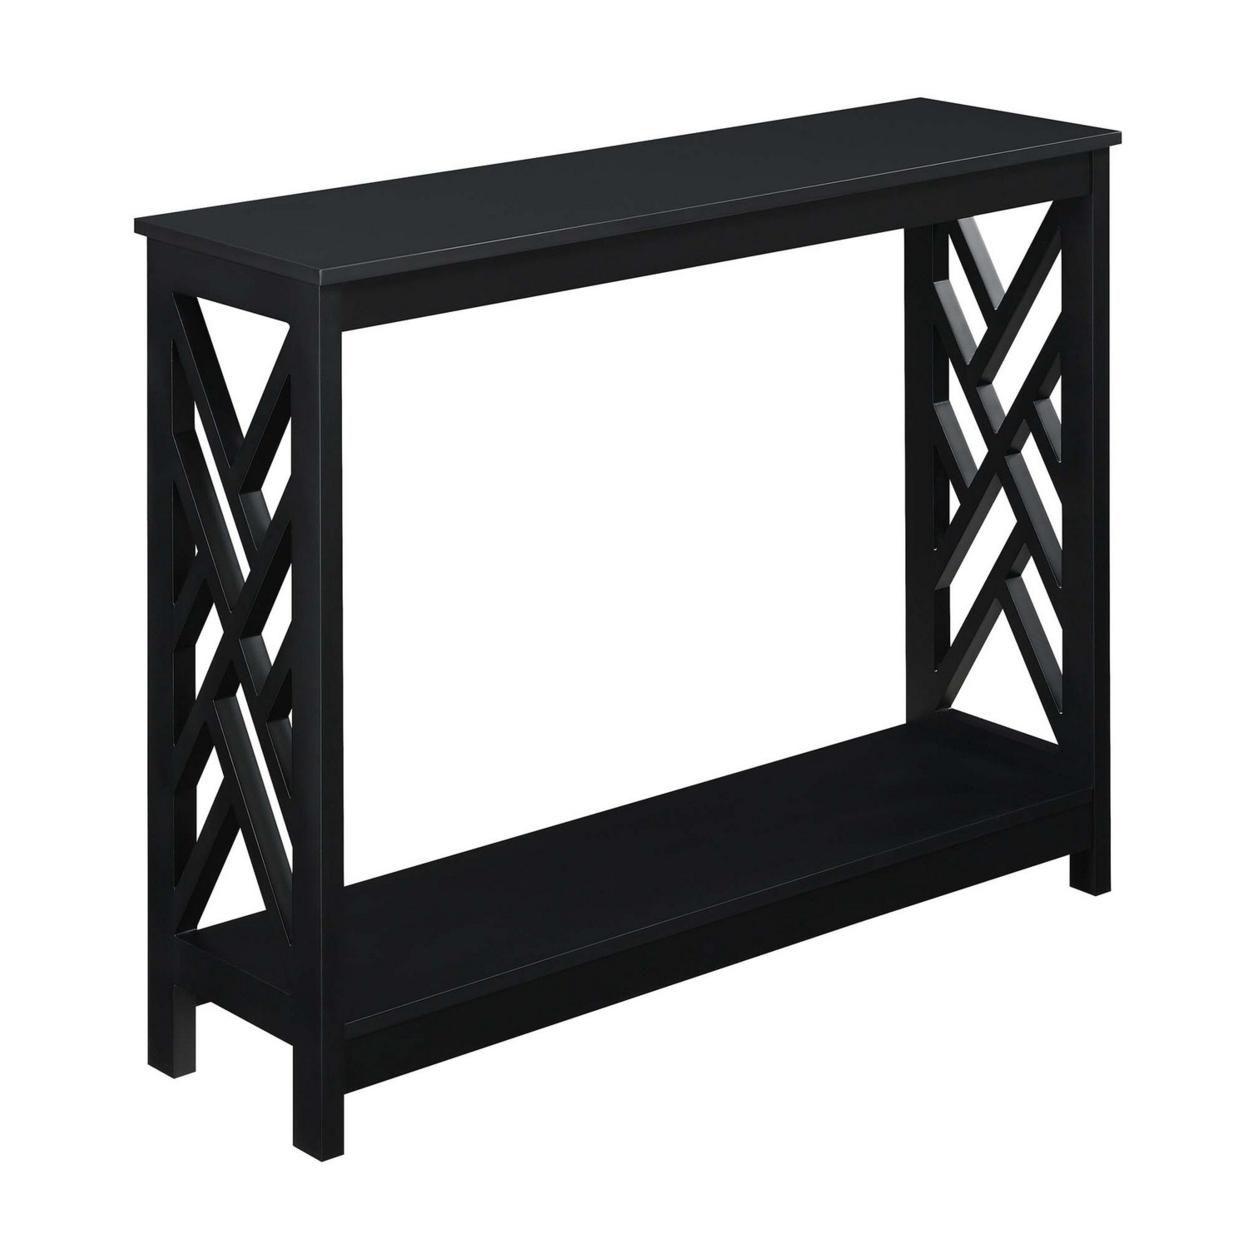 Titan Console Table with Shelf, Black